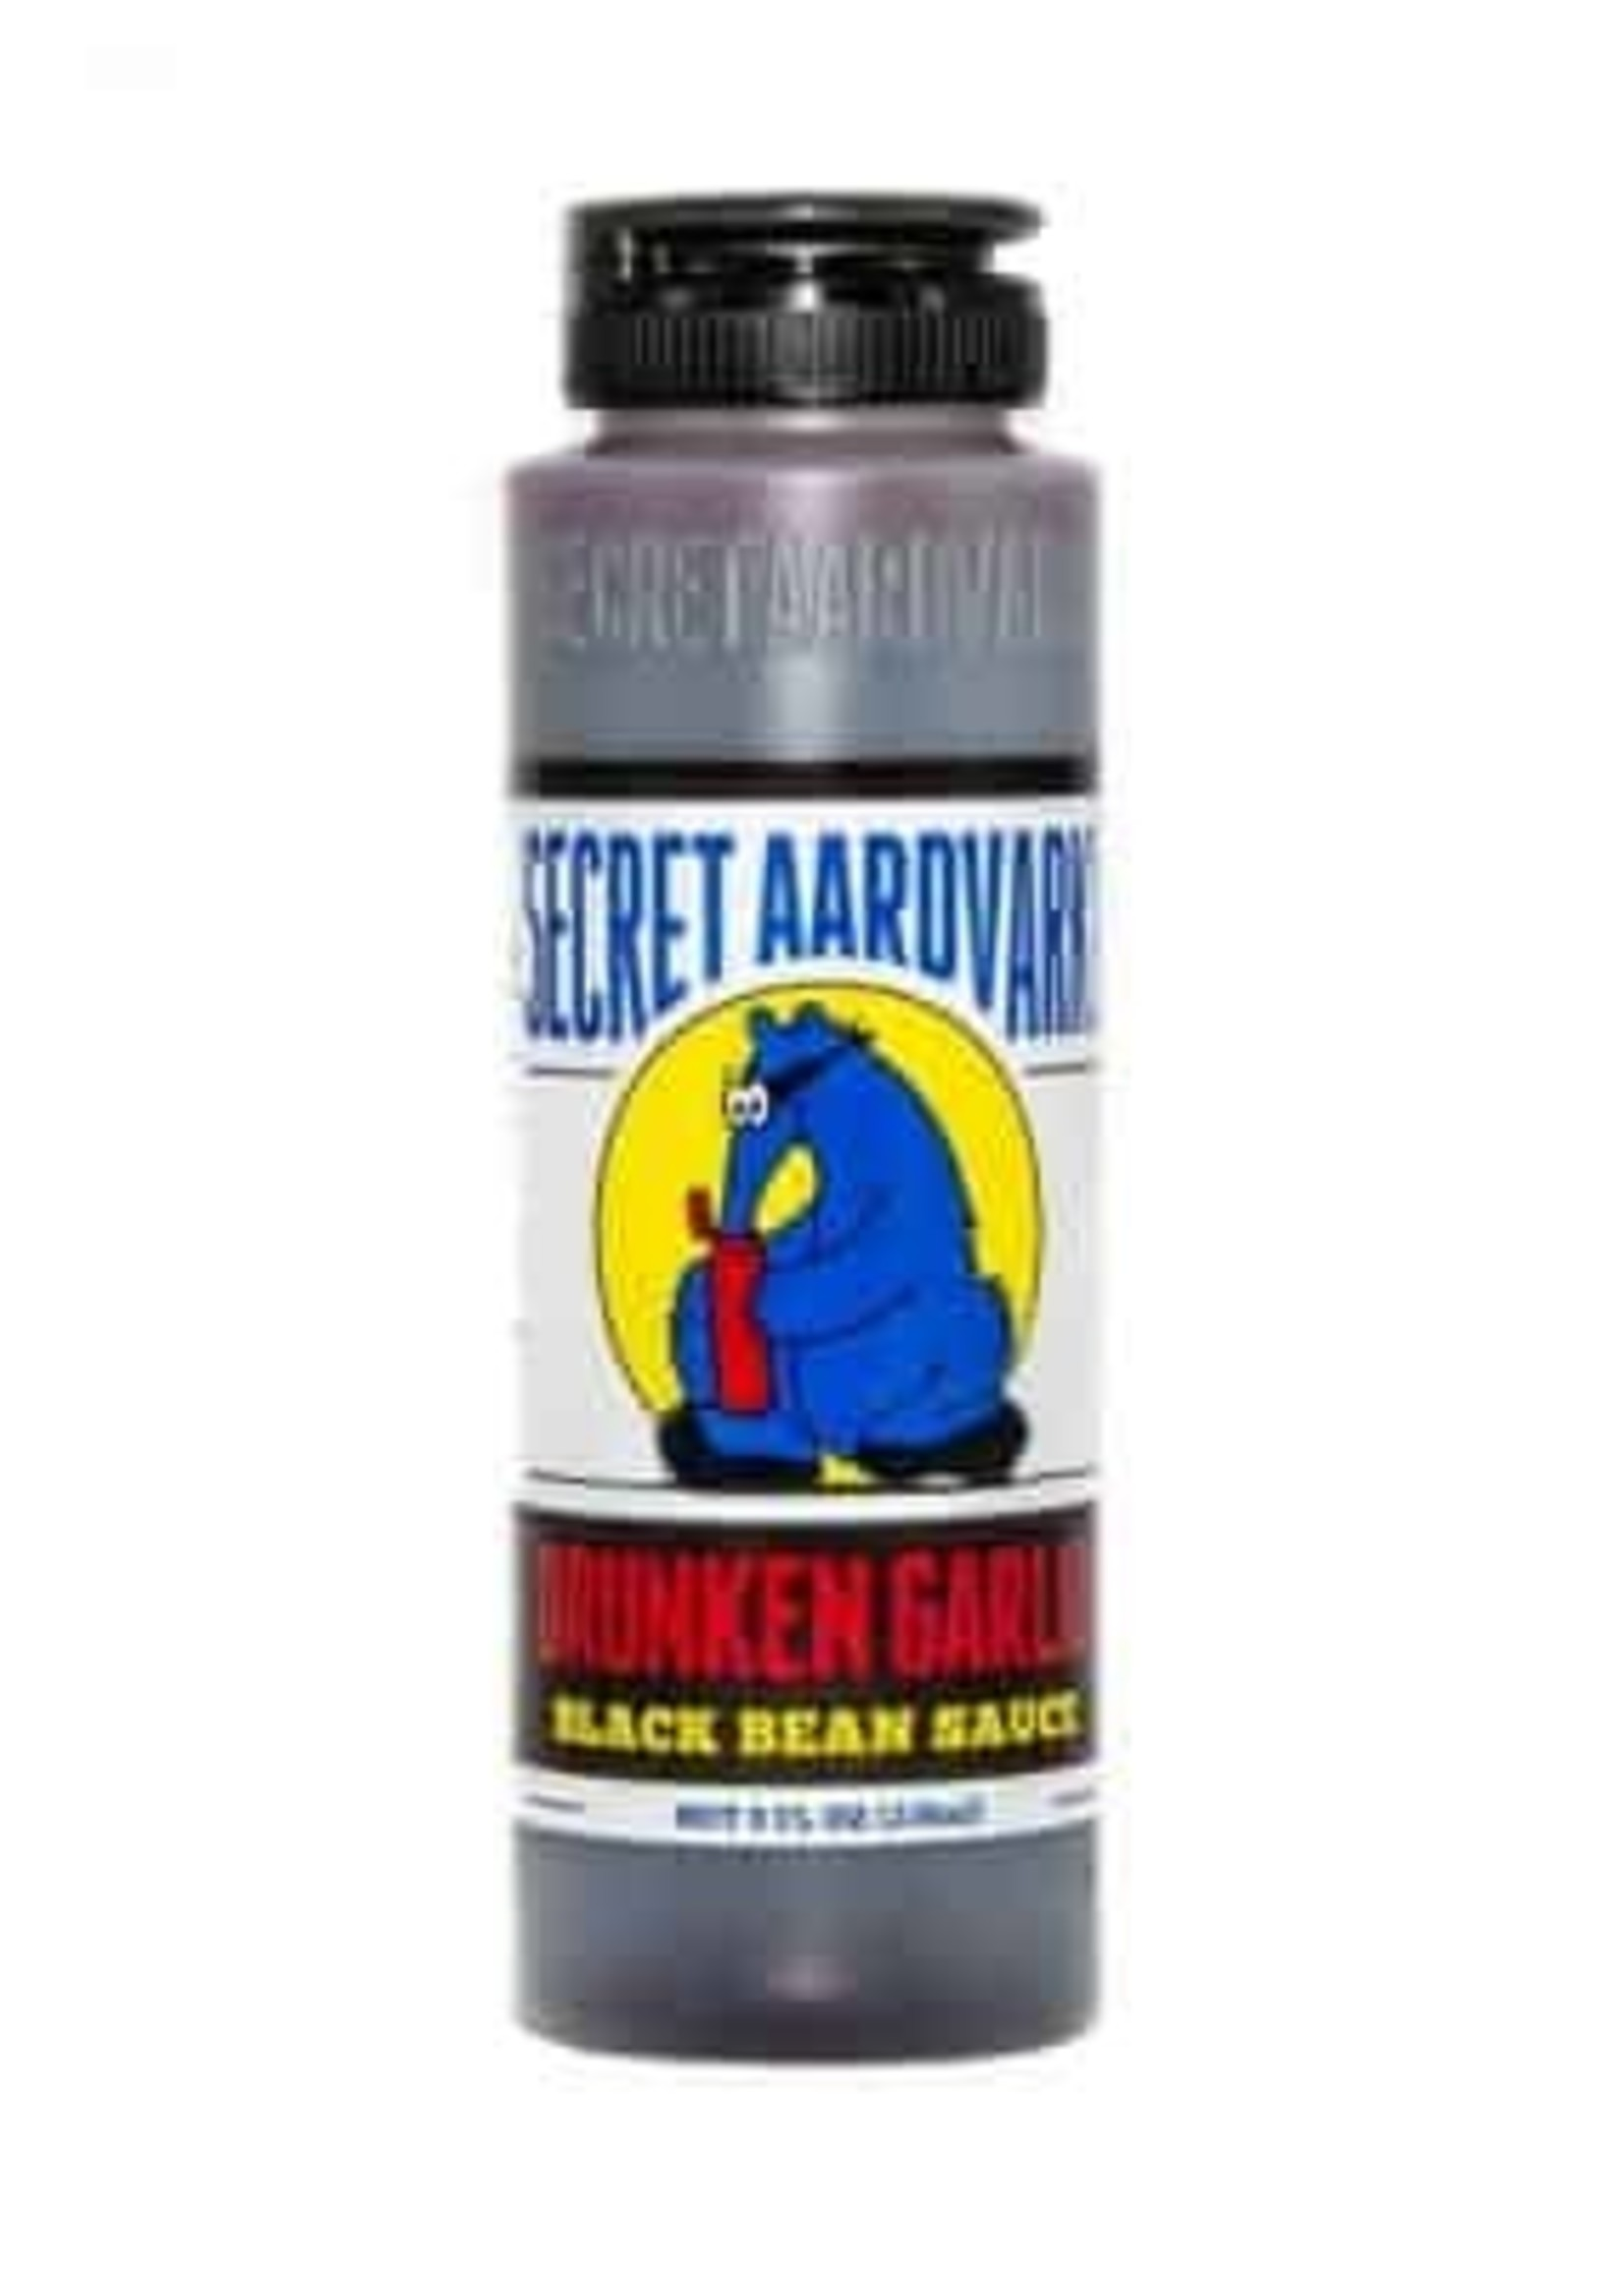 Secret Aardvark Trading Co Drunken Garlic Black Bean Sauce